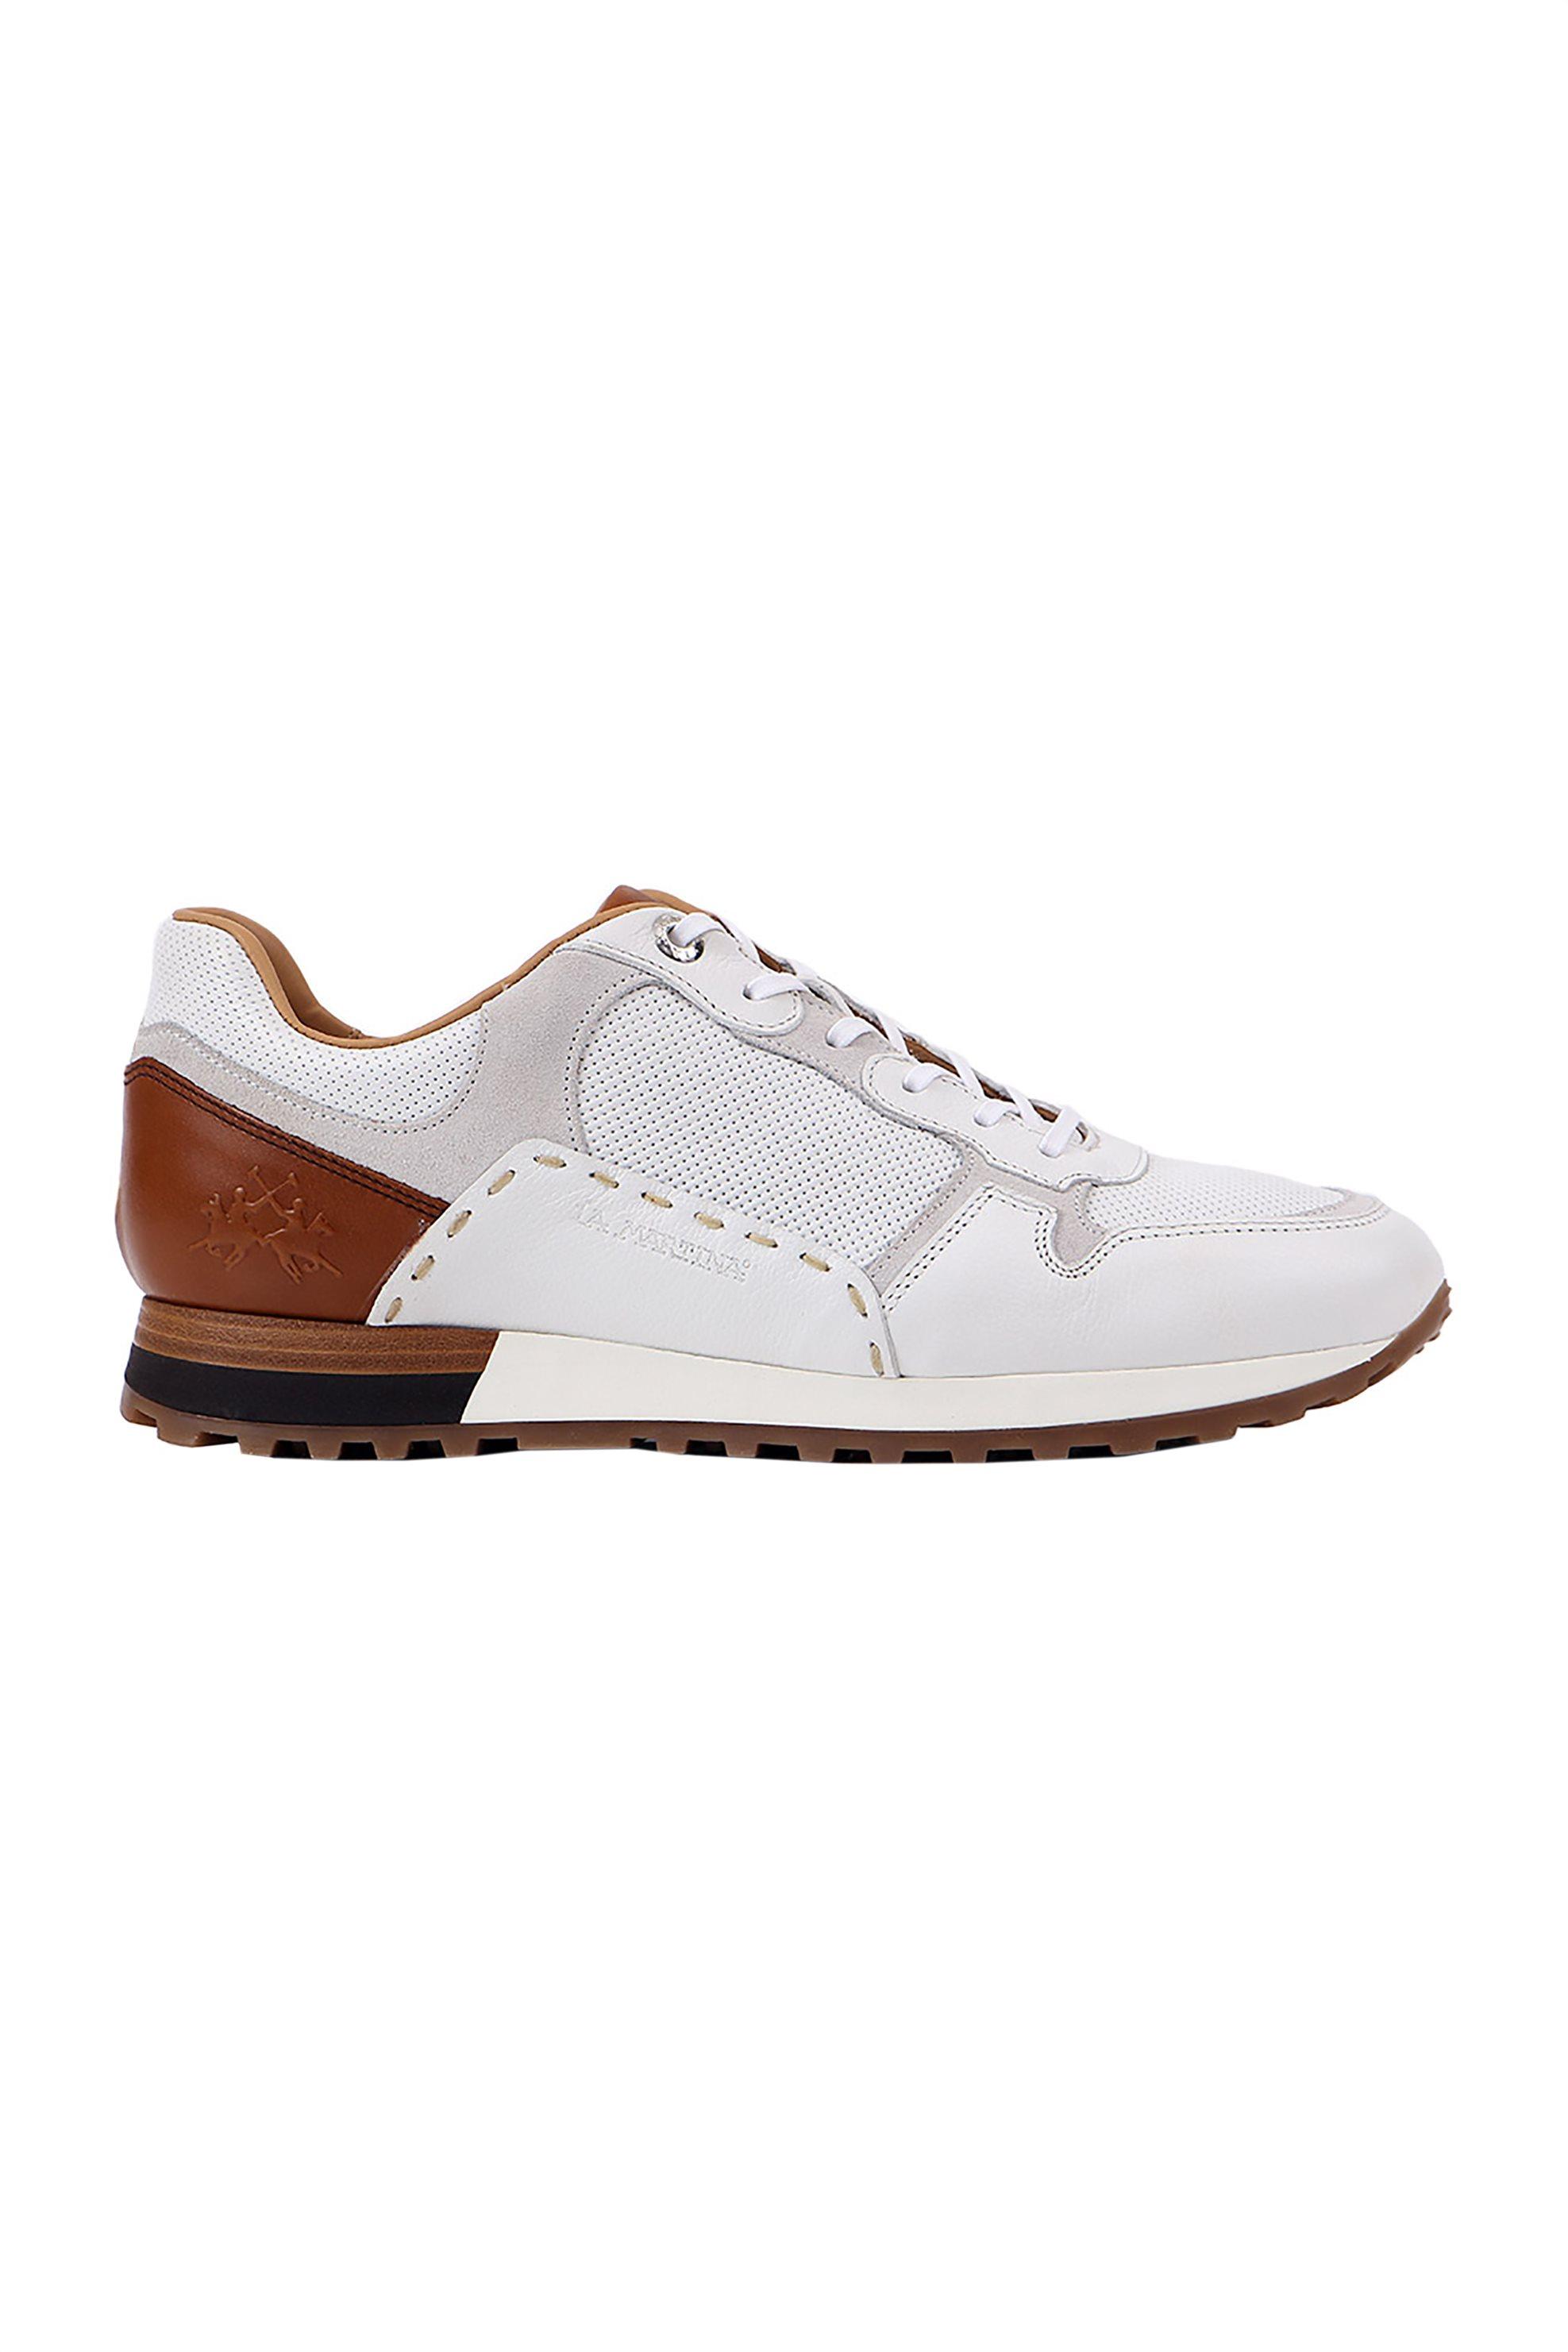 "La Martina ανδρικά δερμάτινα sneakers με κορδόνια ""Scarpa"" – LFM201021-1100 – Λευκό"